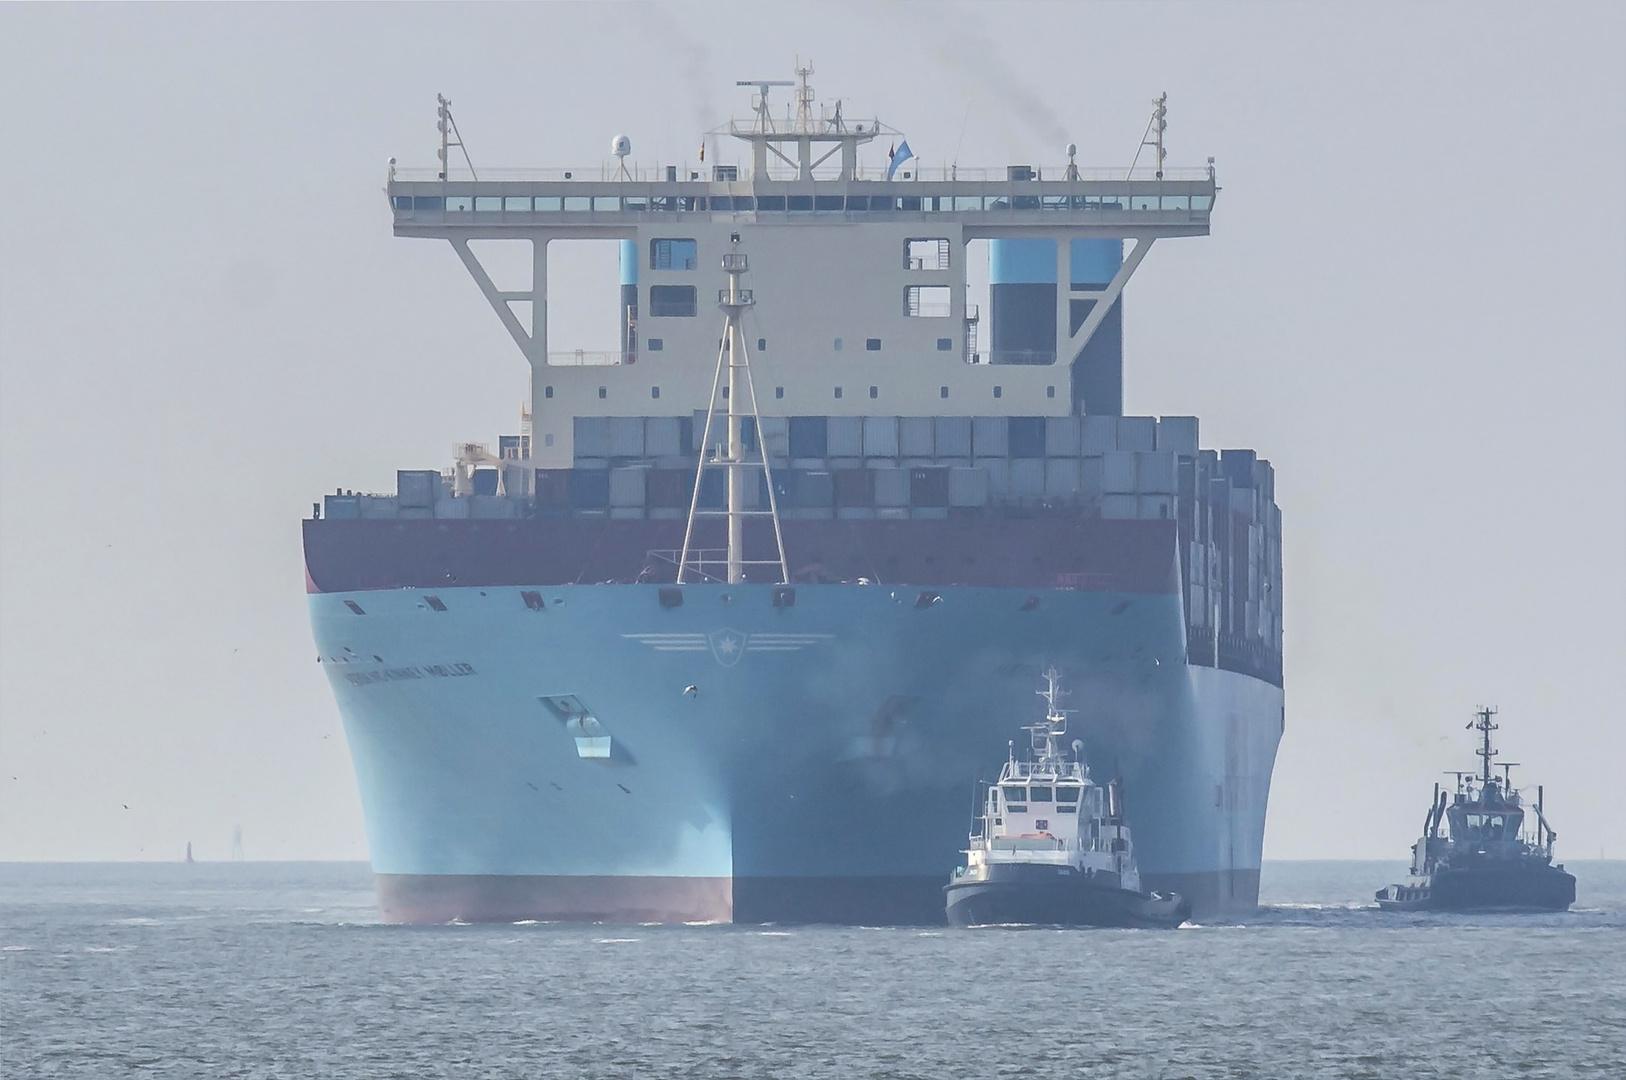 Maersk Mc-Kinney Möller am Haken